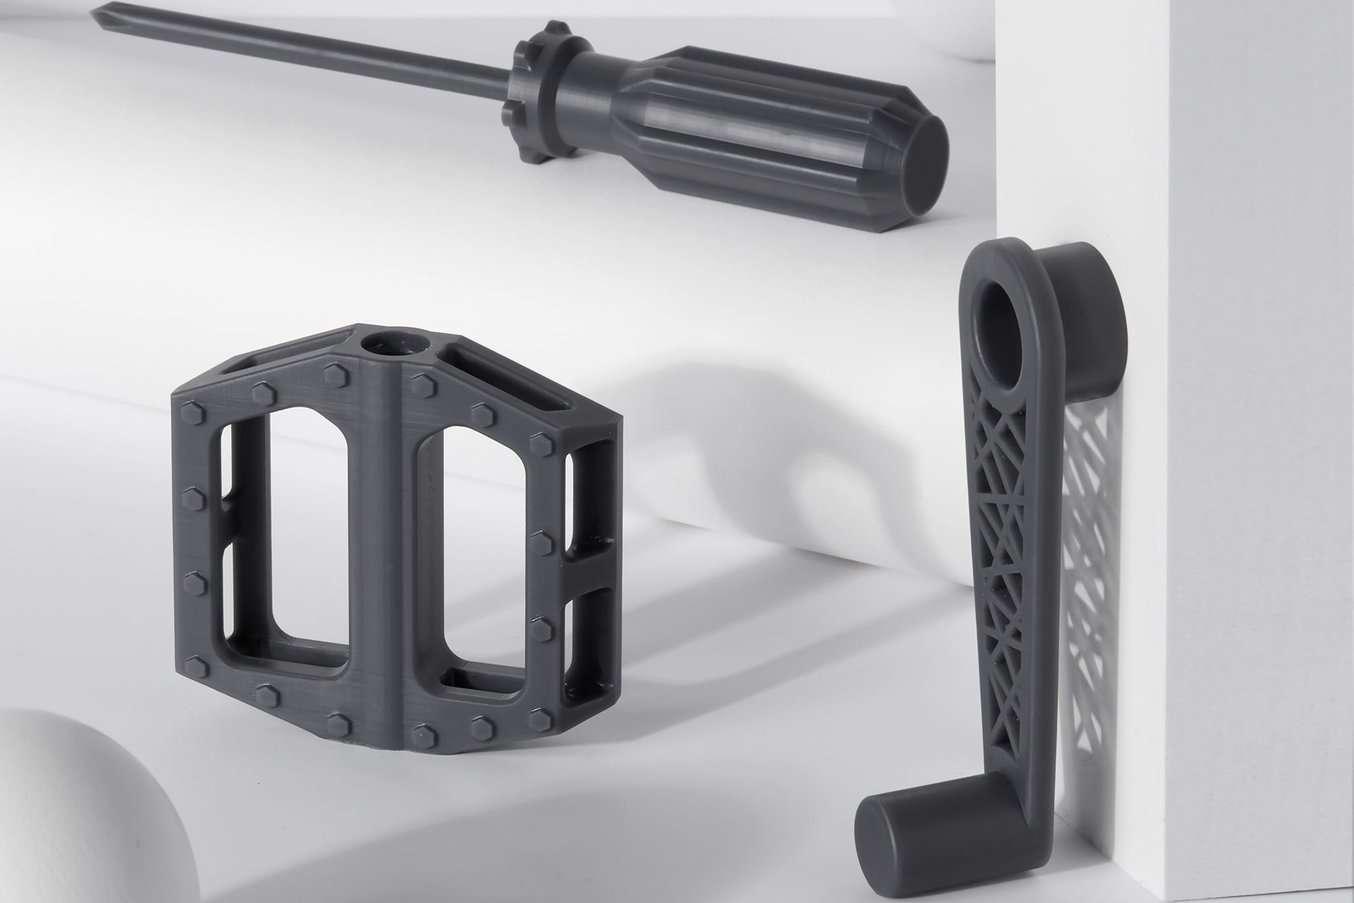 Tough - 3D Printing in Resins